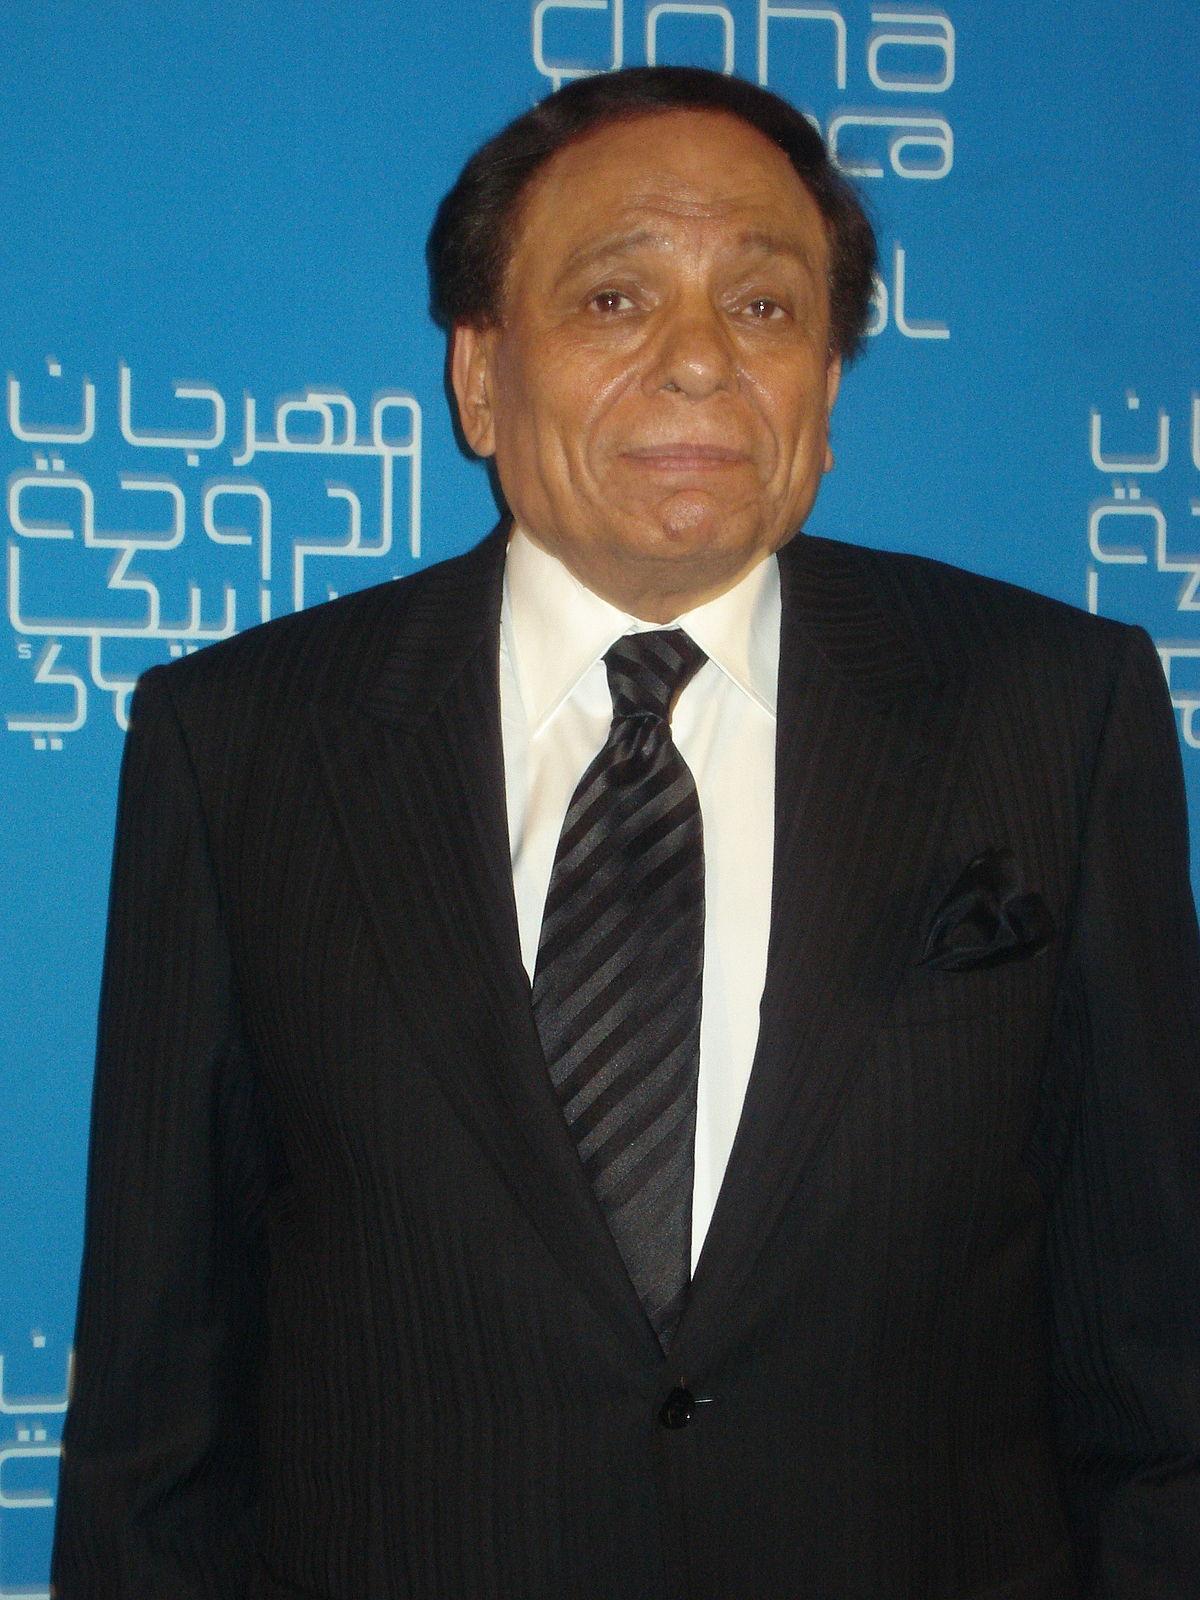 Image Result For Adel Emam Movie